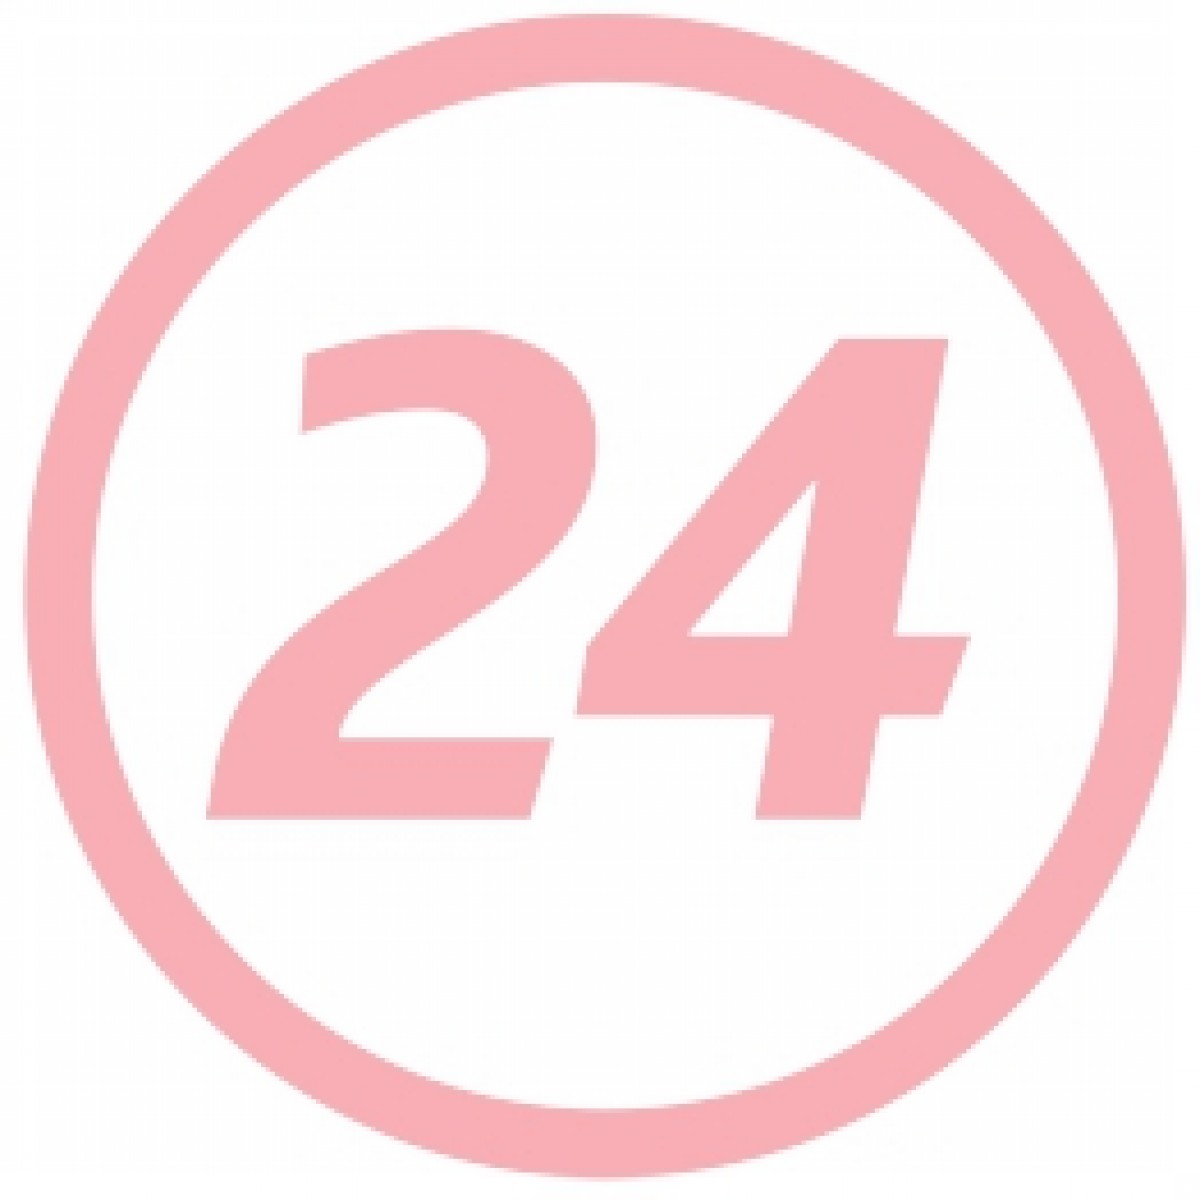 Primii Pasi Set Siguranta Copii 15 de Componente, Set Siguranta, 1buc